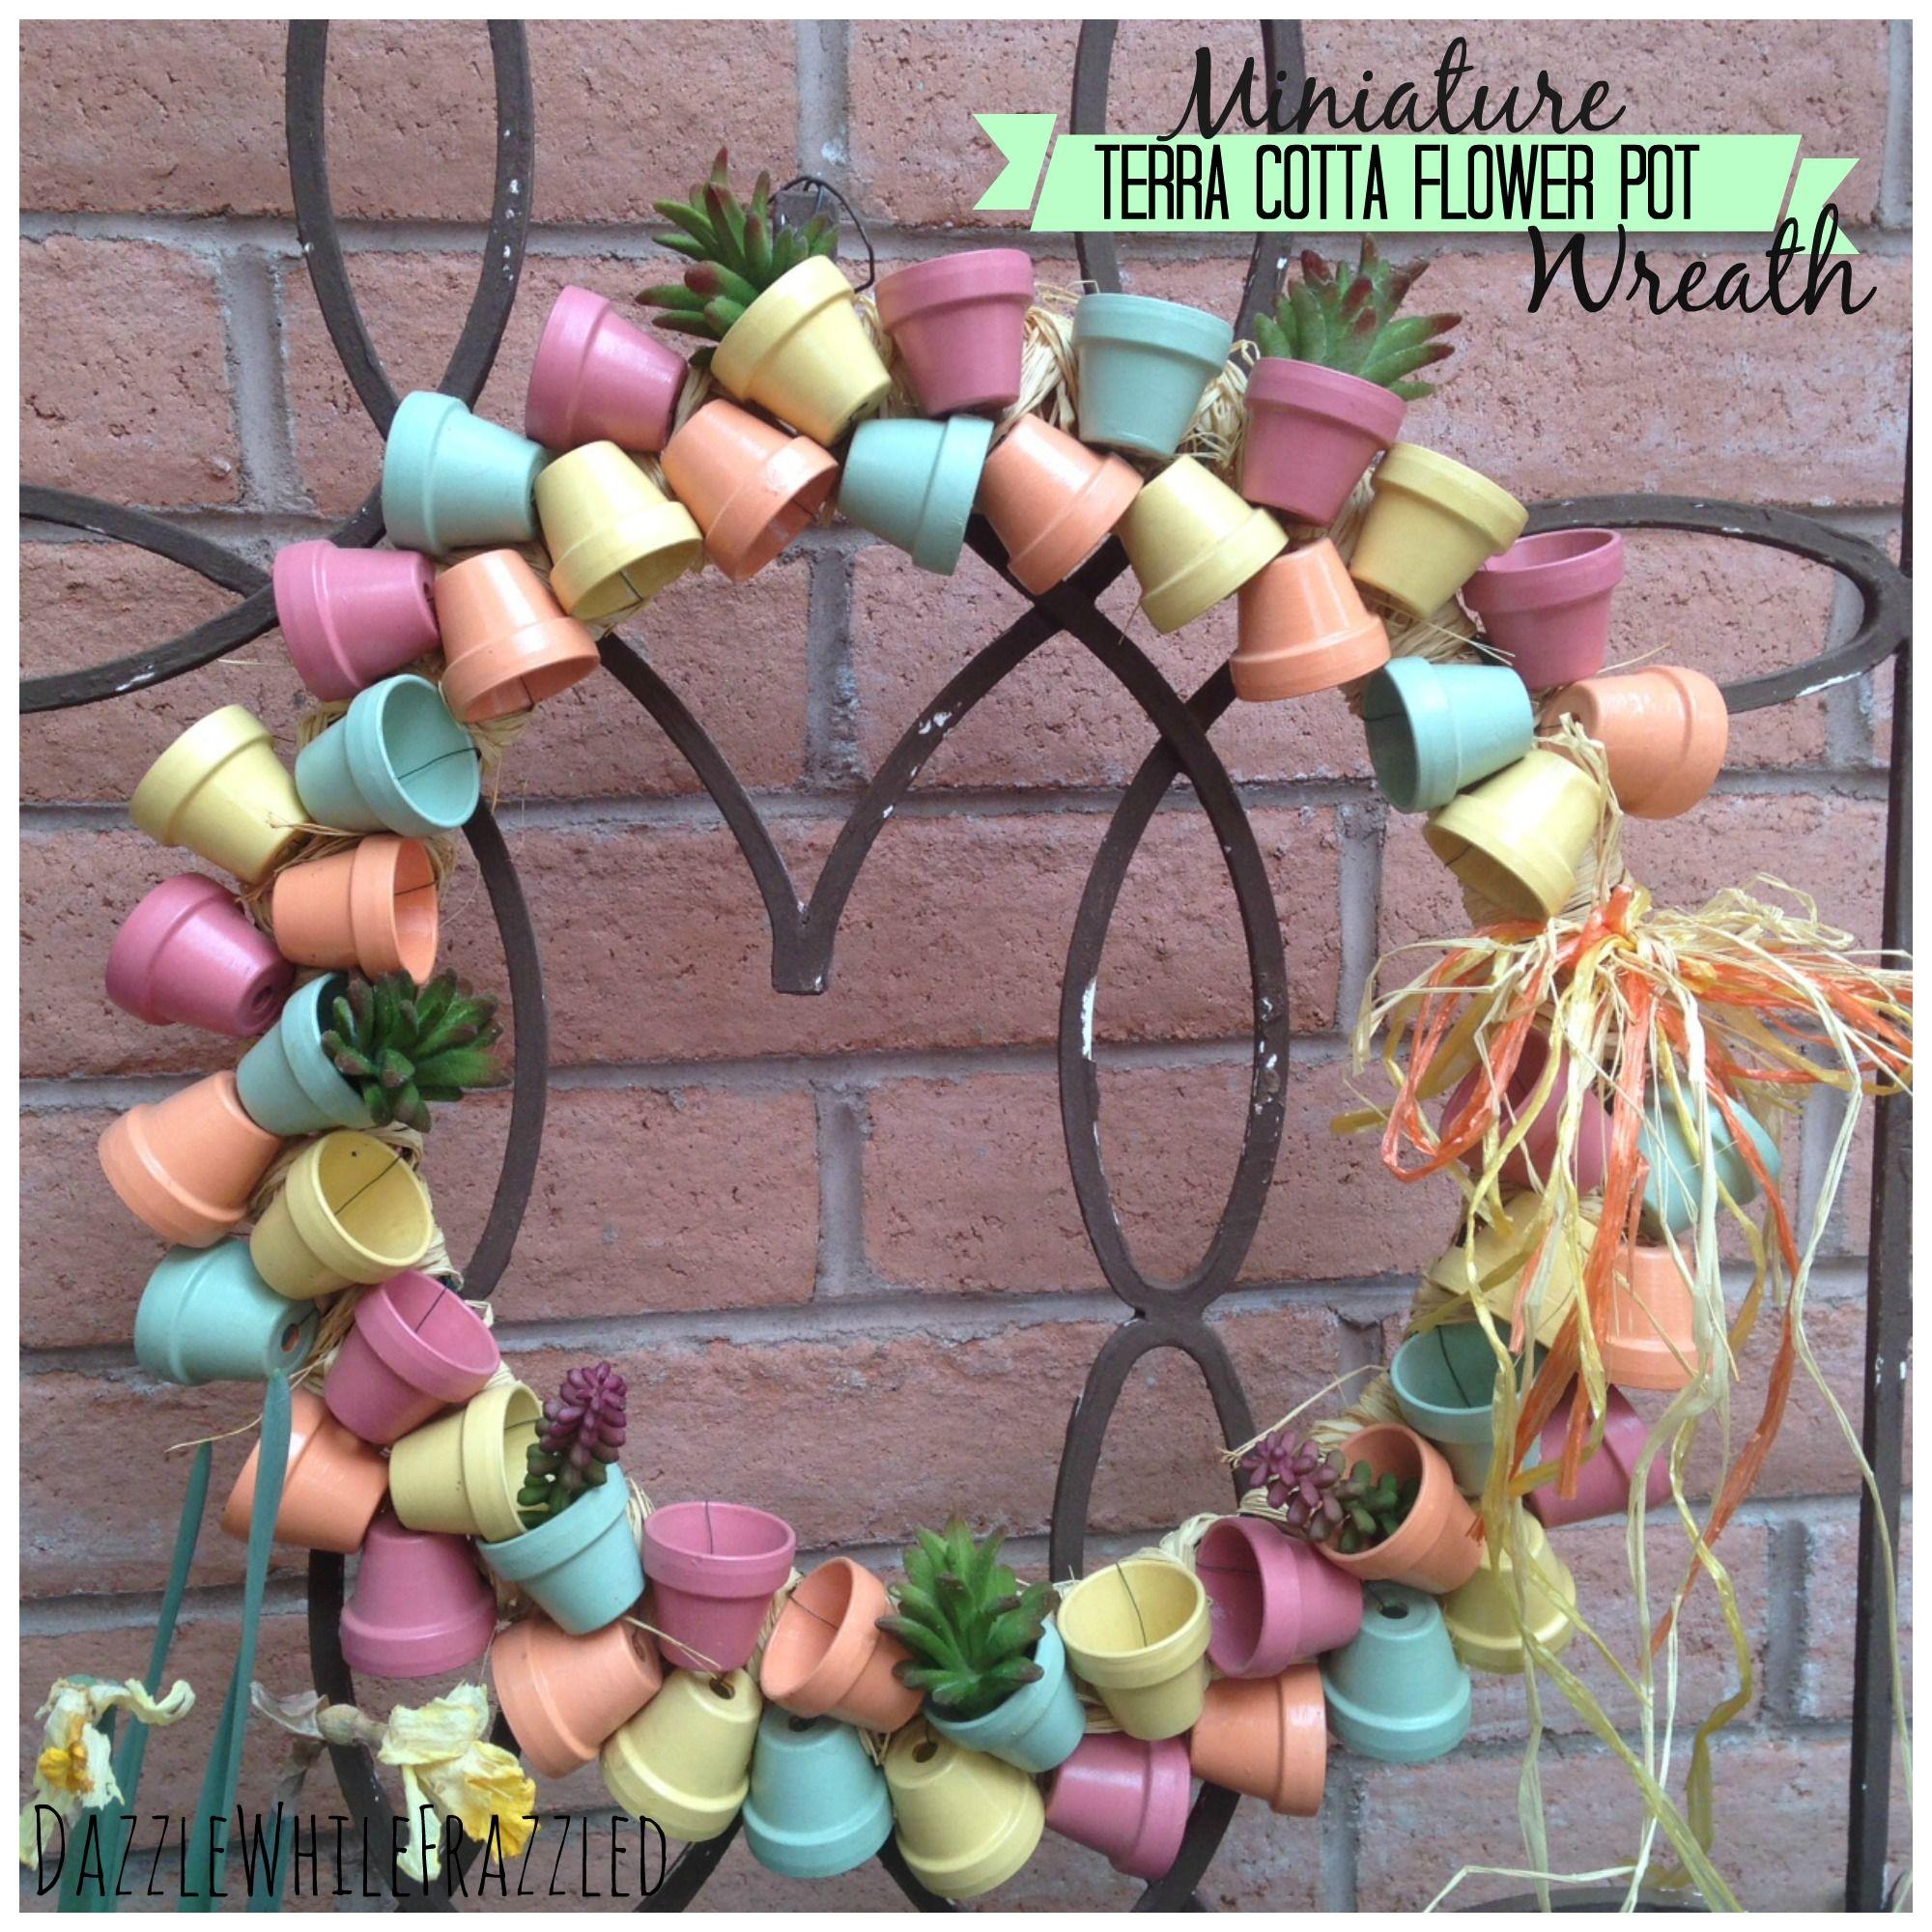 Miniature Terra Cotta Flower Pot Front Door Wreath / via DazzleWhileFrazzled blog